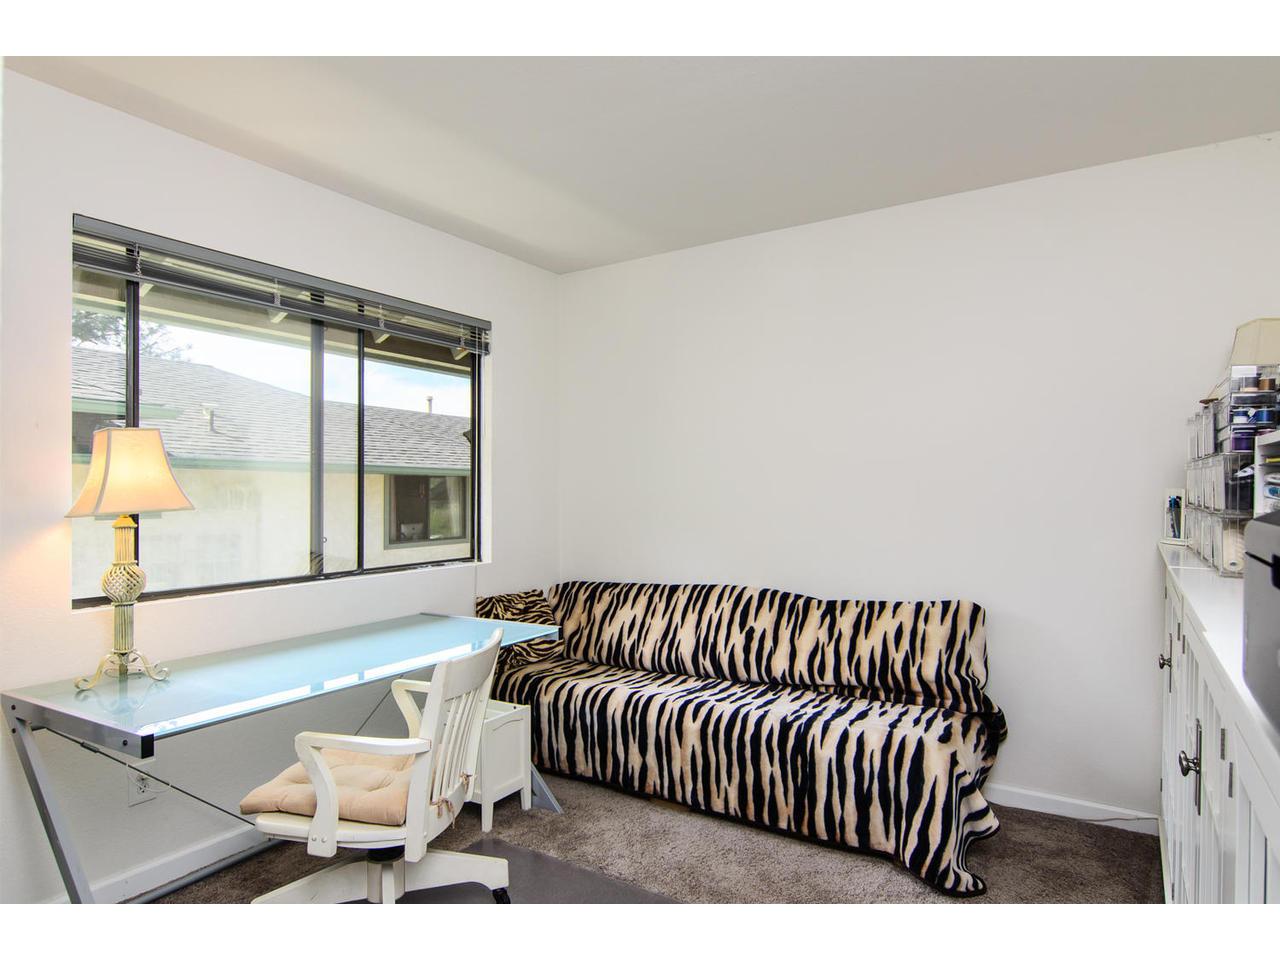 3579 Curlew Street San Diego-MLS_Size-017-3579 Curlew Street San Diego-1280x960-72dpi.jpg